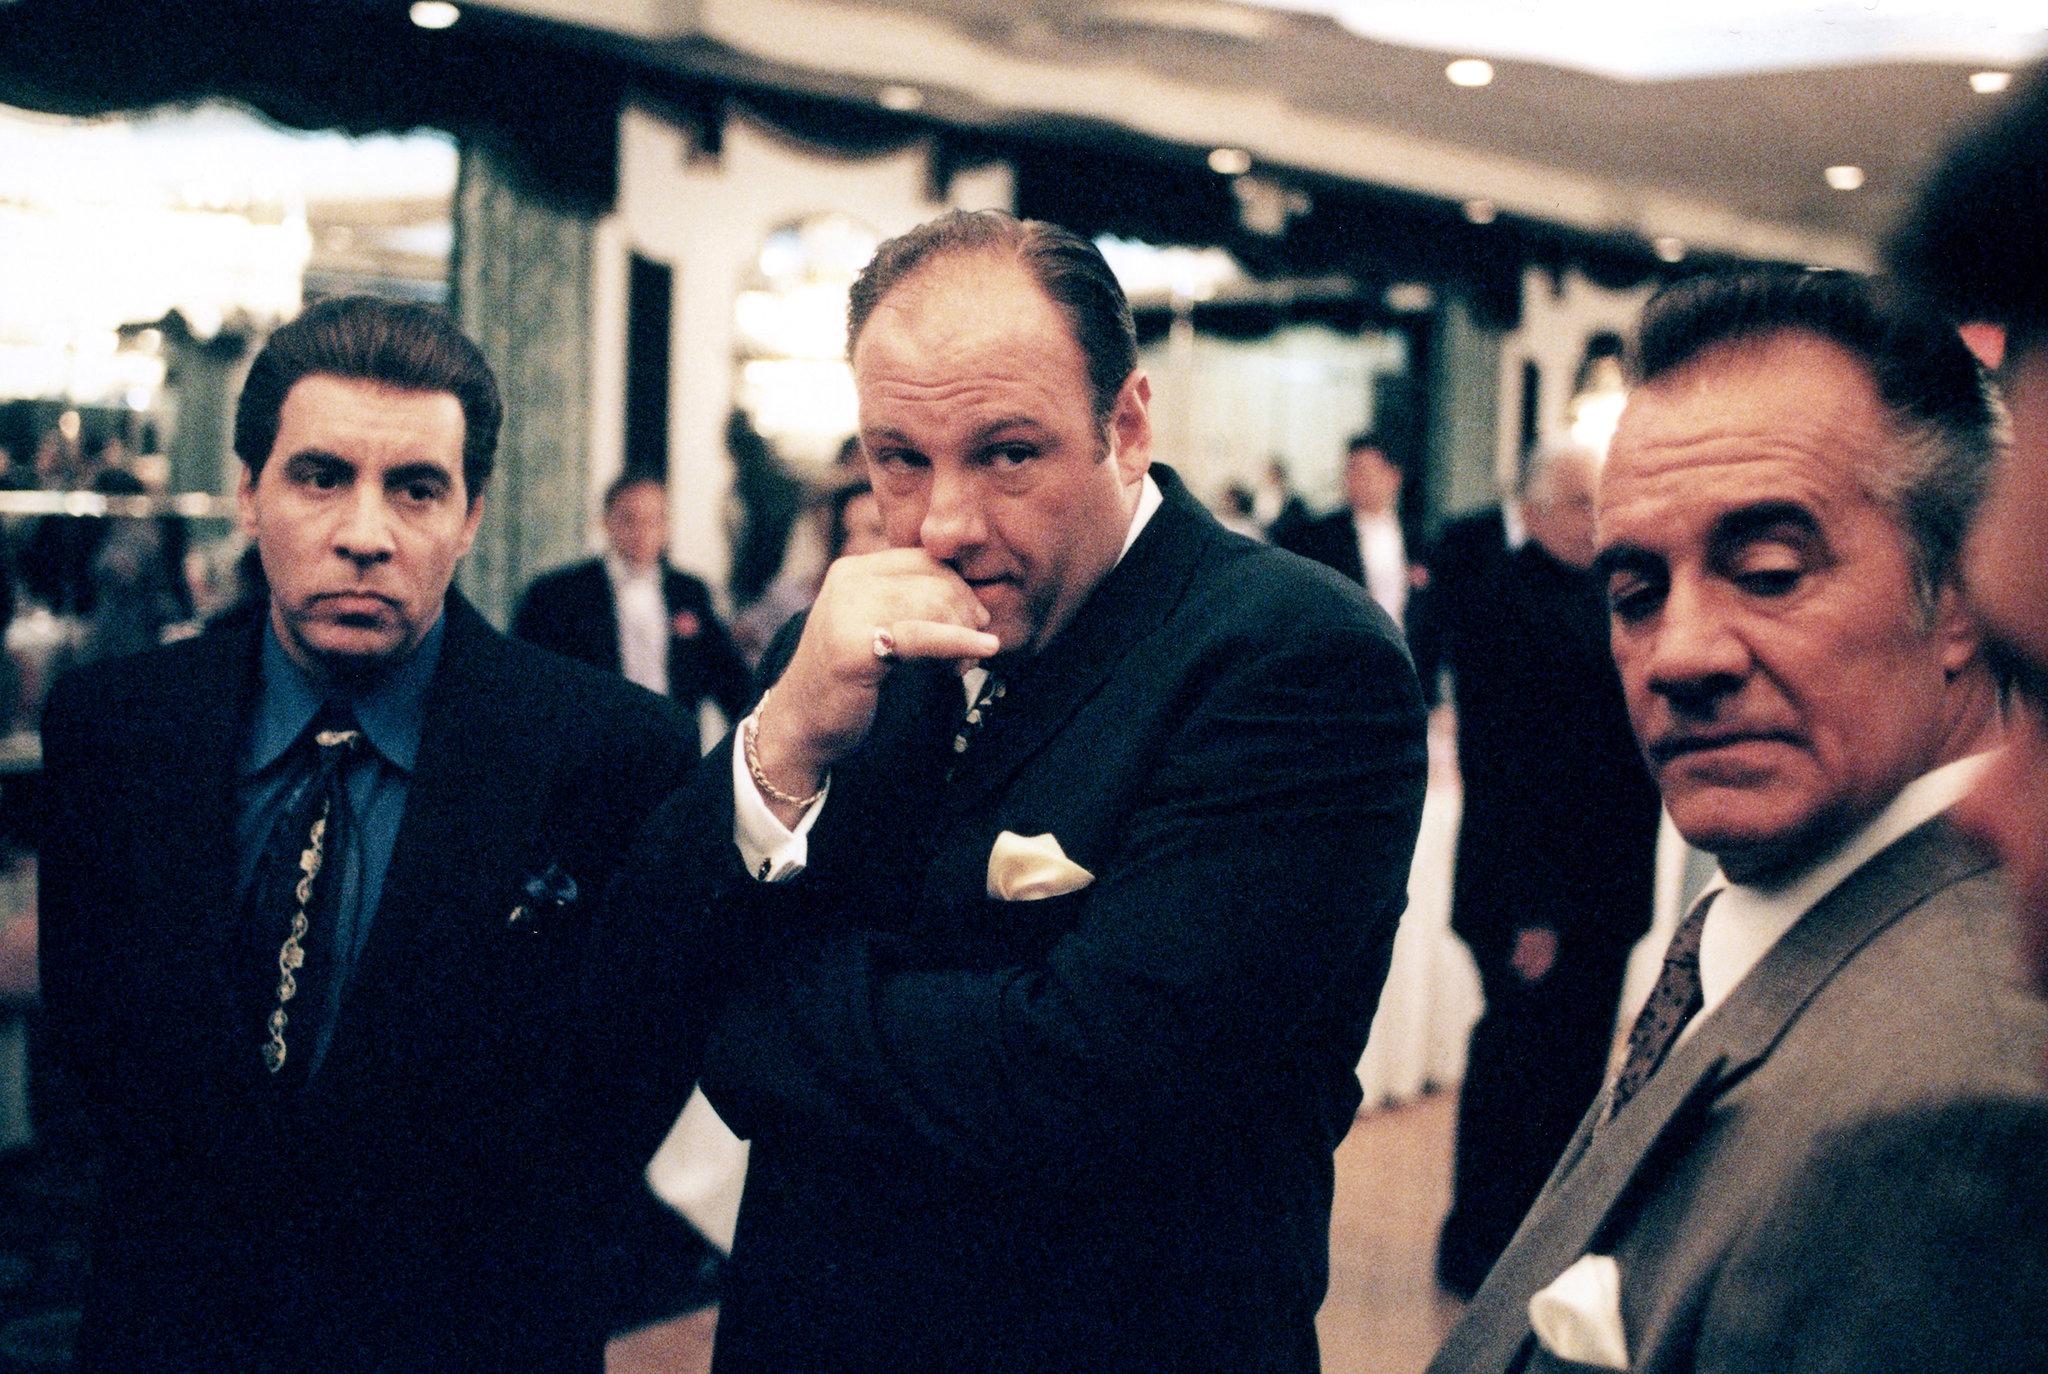 Клан Сопрано (The Sopranos) 1999 - 2007